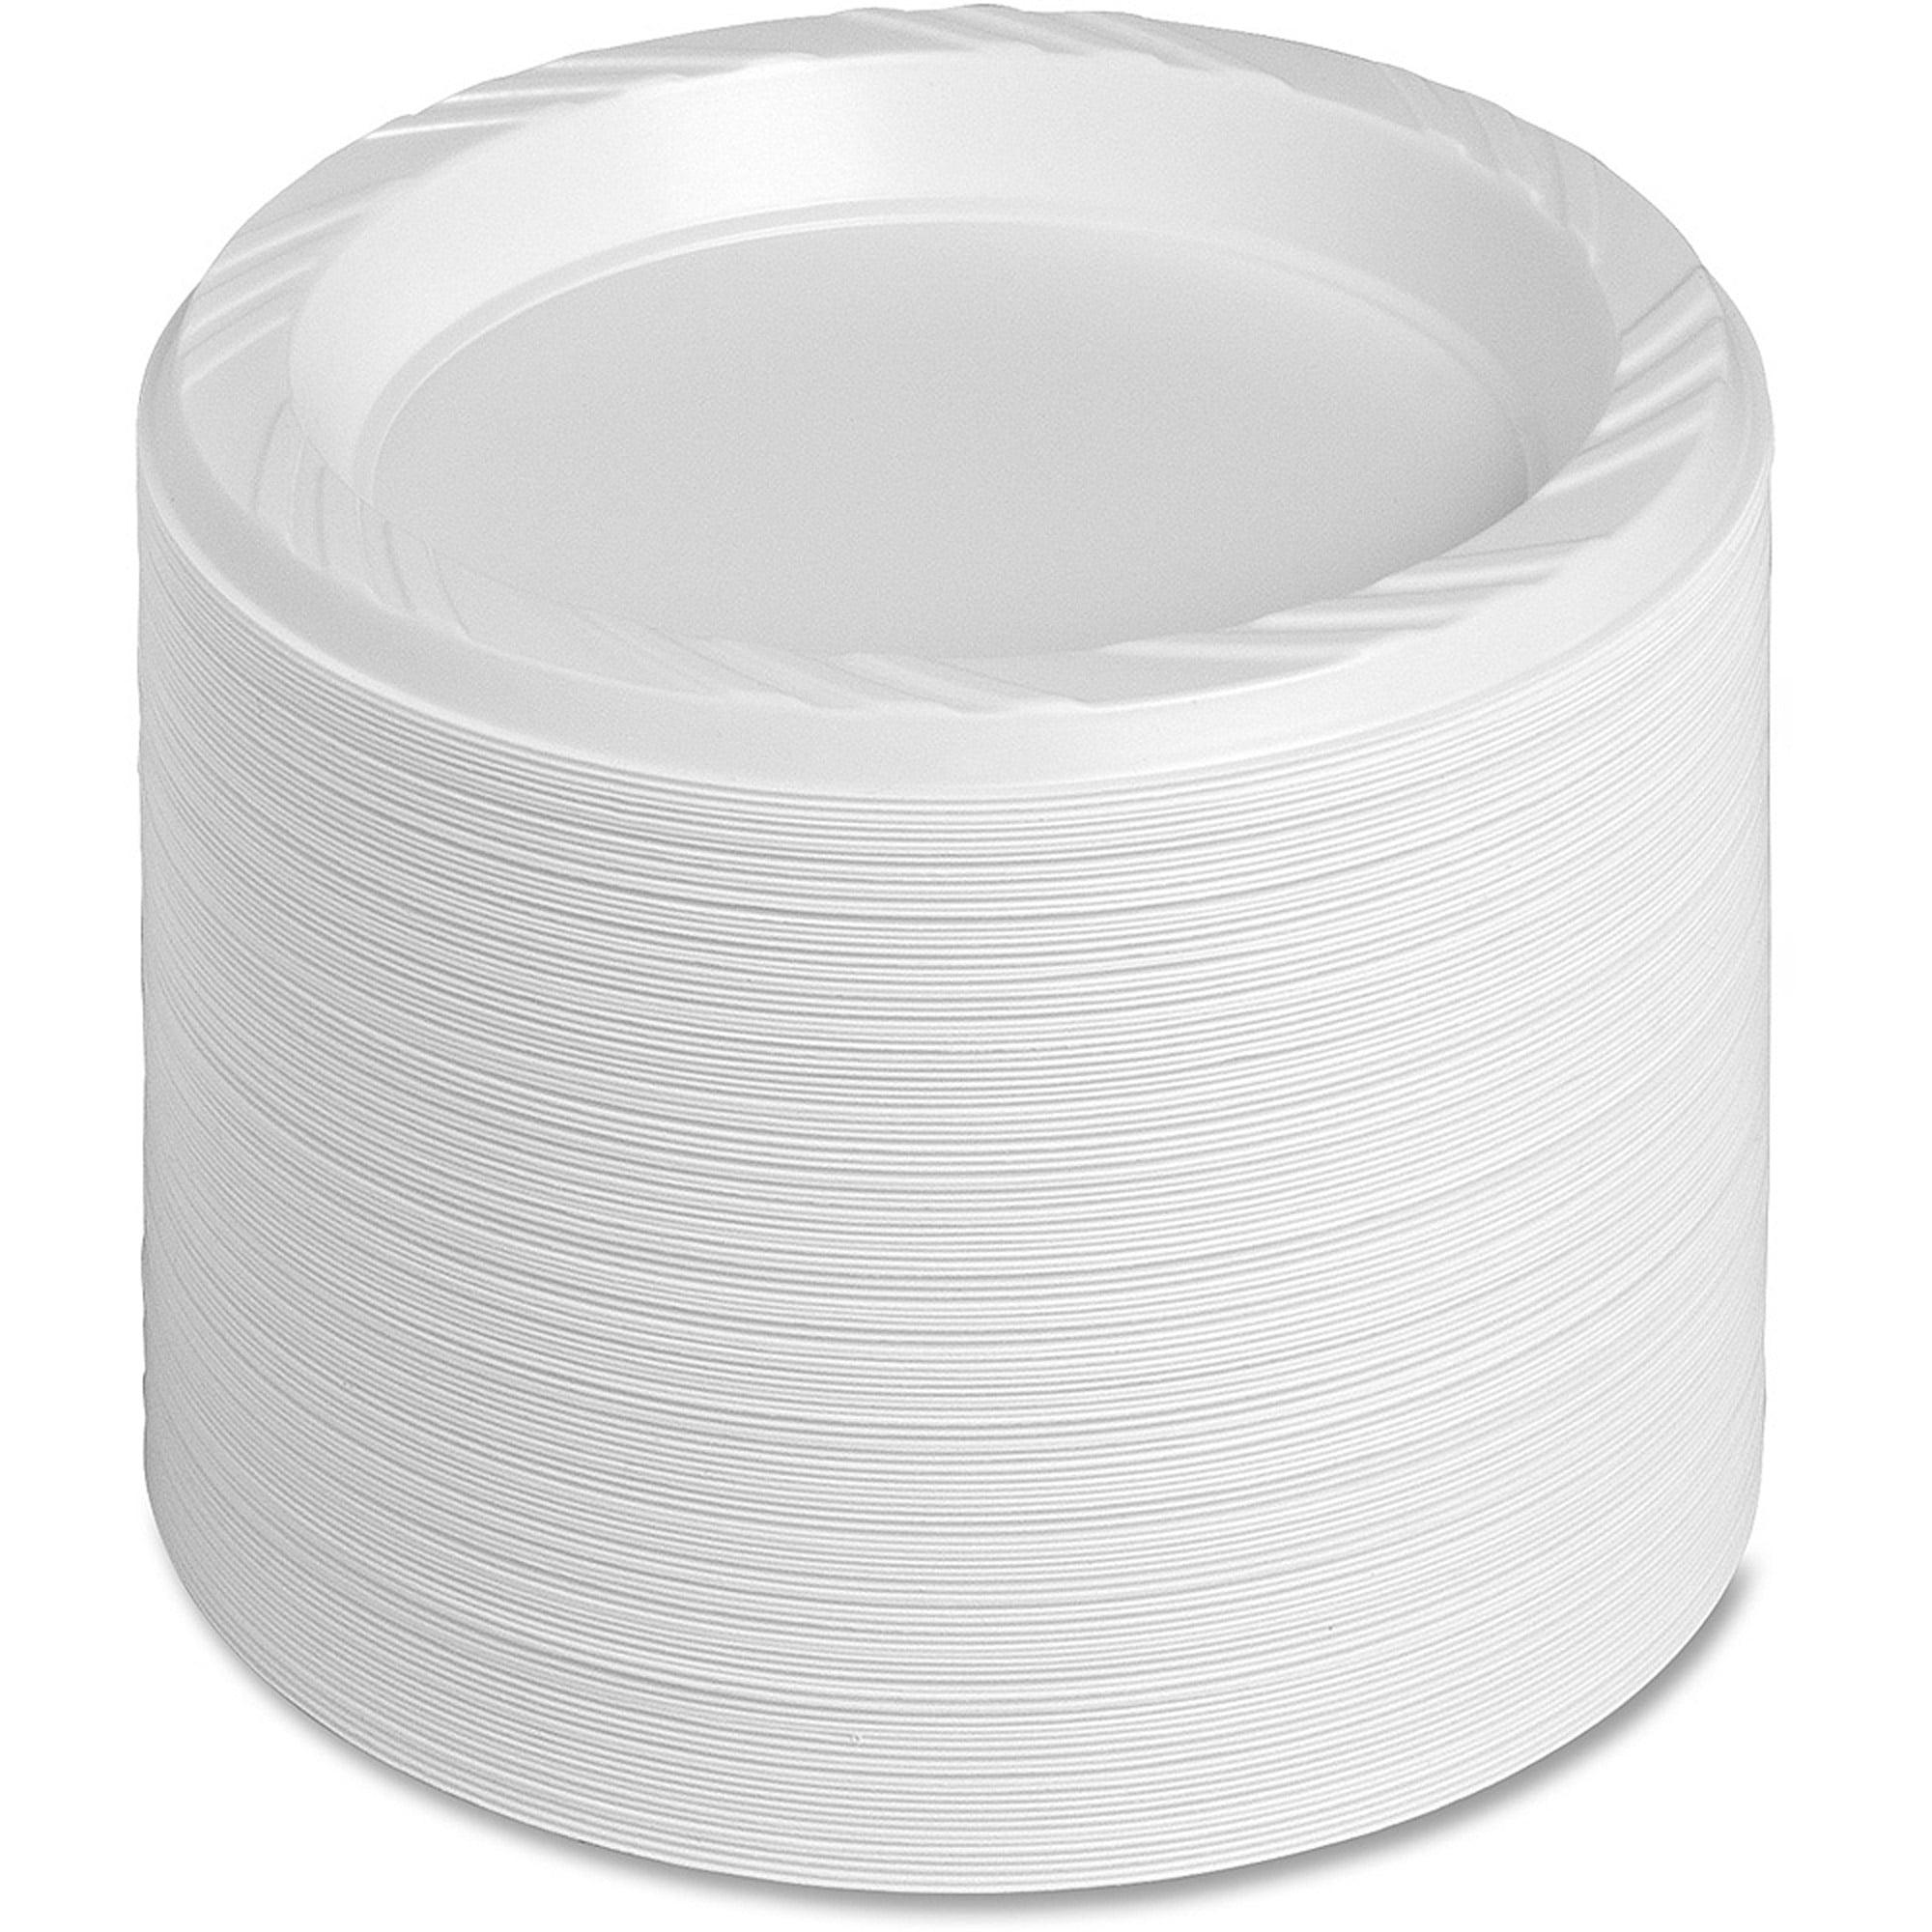 "Genuine Joe Reusable Plastic Plates, White, 6"", 125 pack, GJO10327"